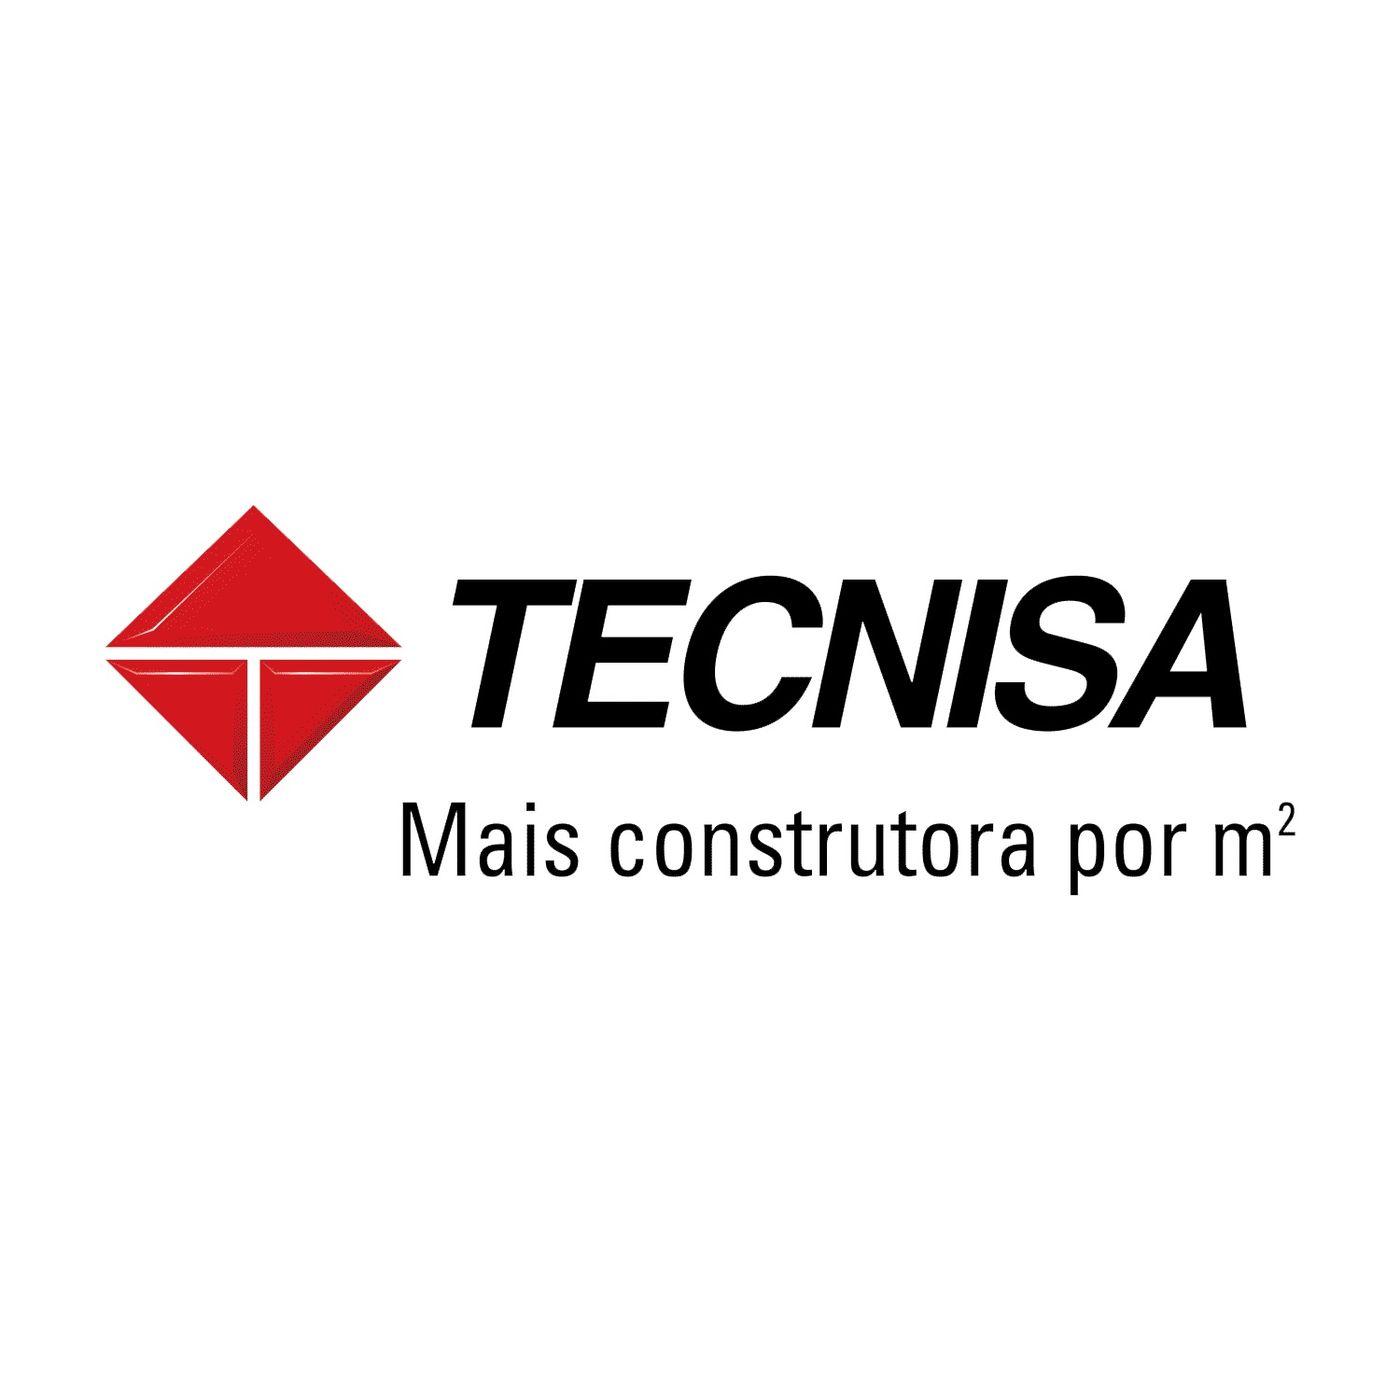 Teleconferência do Resultado Tecnisa (tcsa3) 4 trimestre 2019 - 4t19